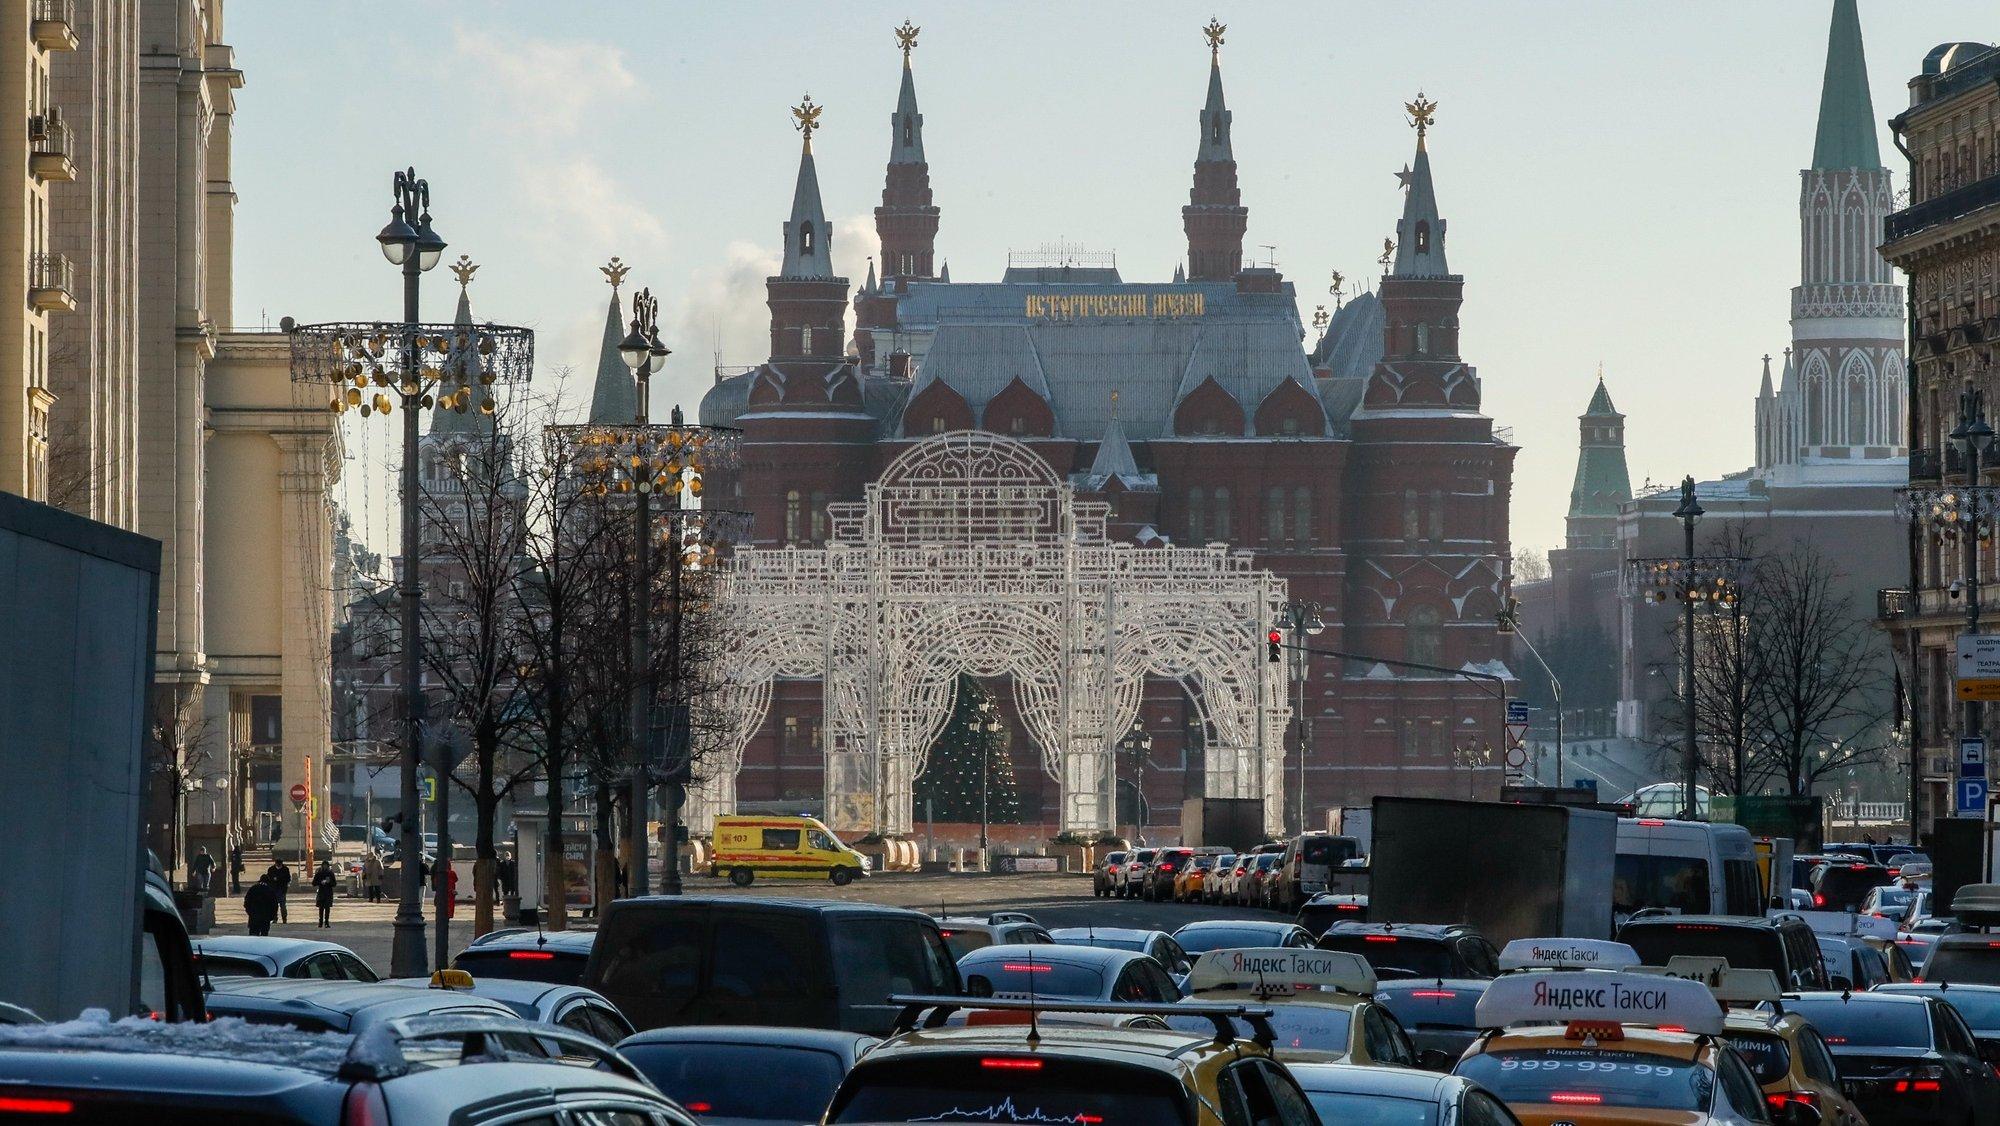 epa08868507 Traffic jam on Tverskaya street in Moscow, Russia, 07 December 2020.  EPA/YURI KOCHETKOV